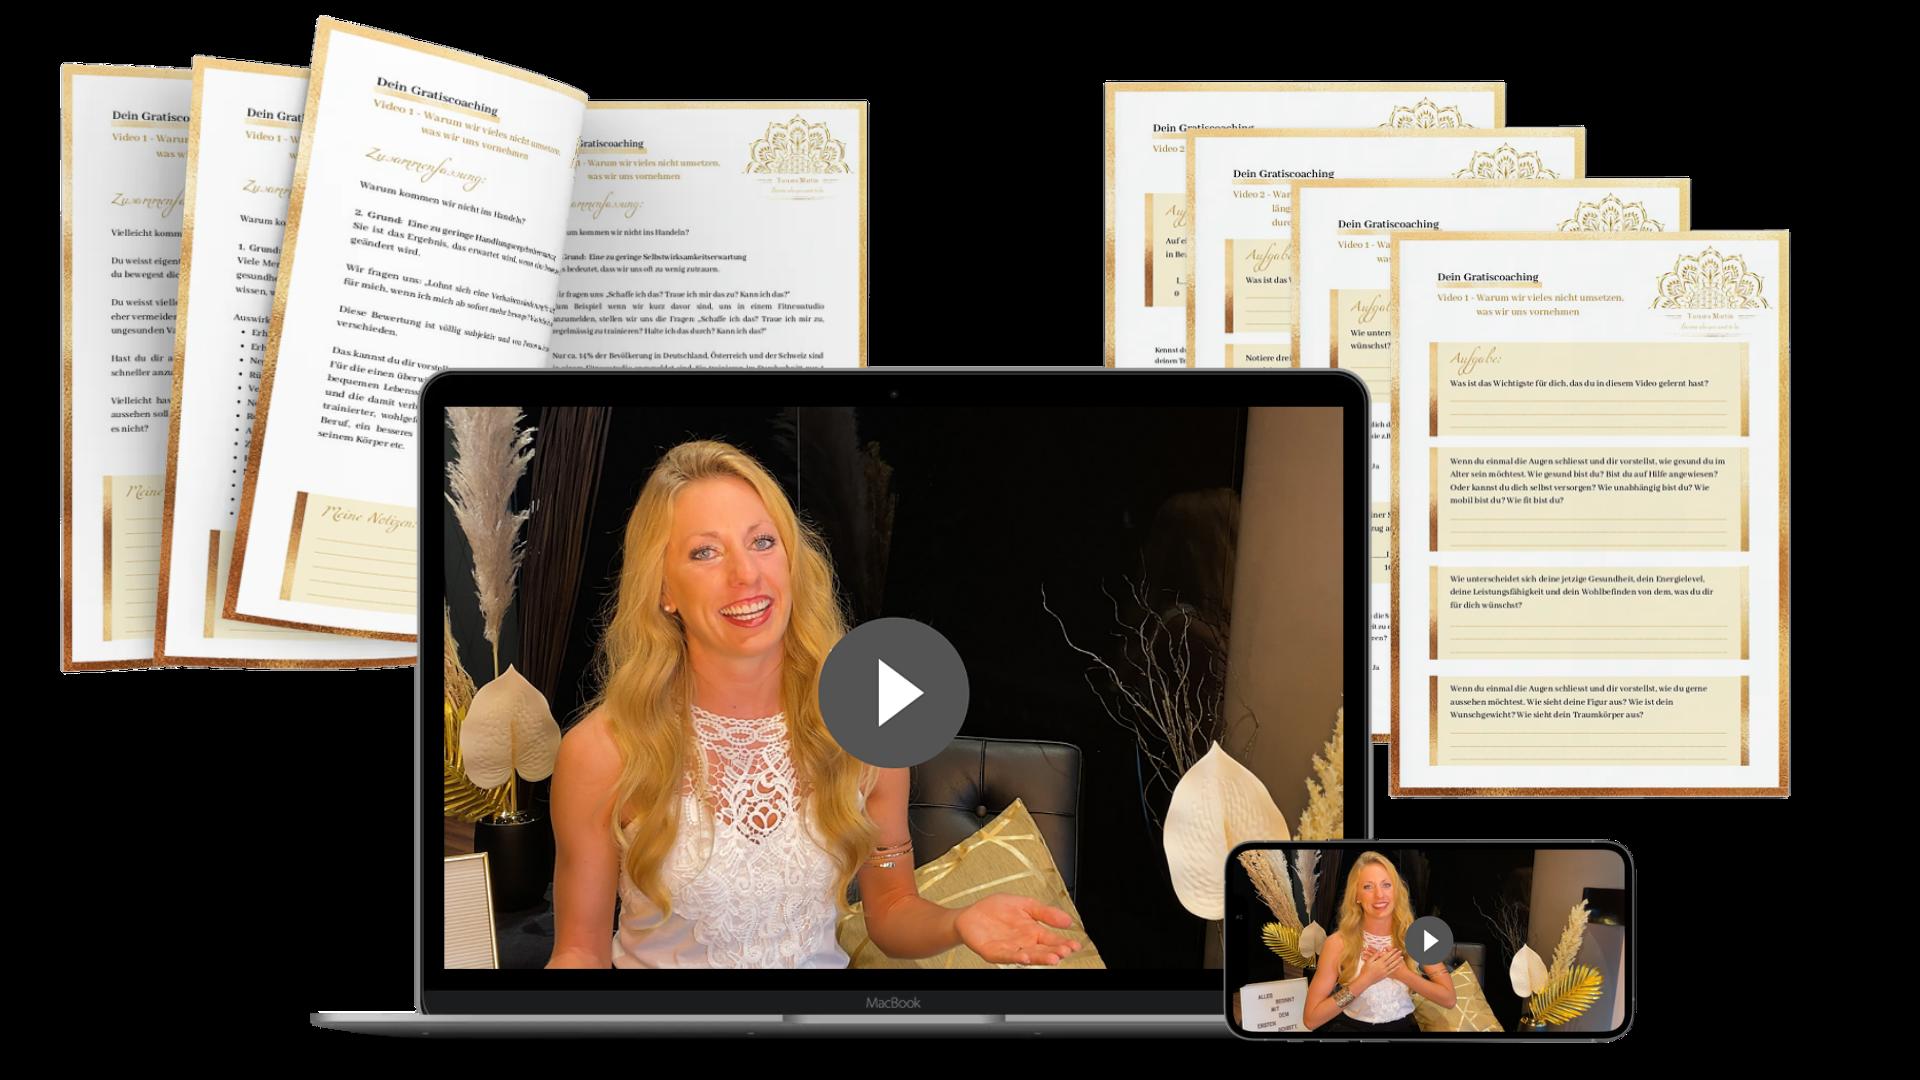 Tamara Martin Coaching Online Video Motivation Abnehmen Gesundheit Coach